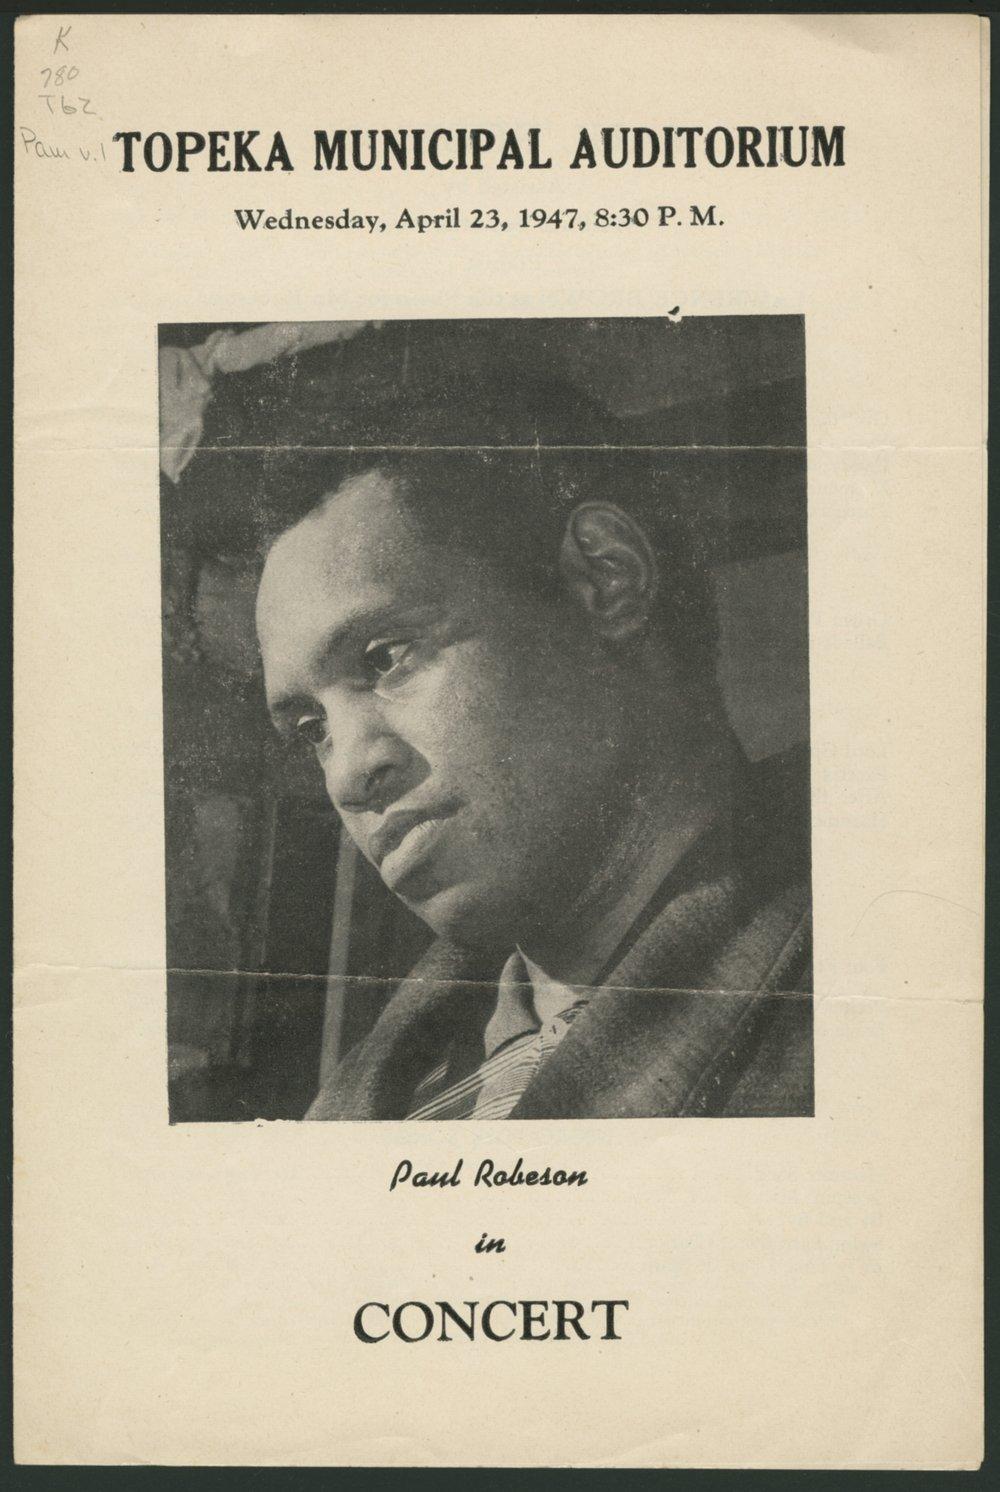 Paul Robeson in concert, Topeka Municipal Auditorium - 1